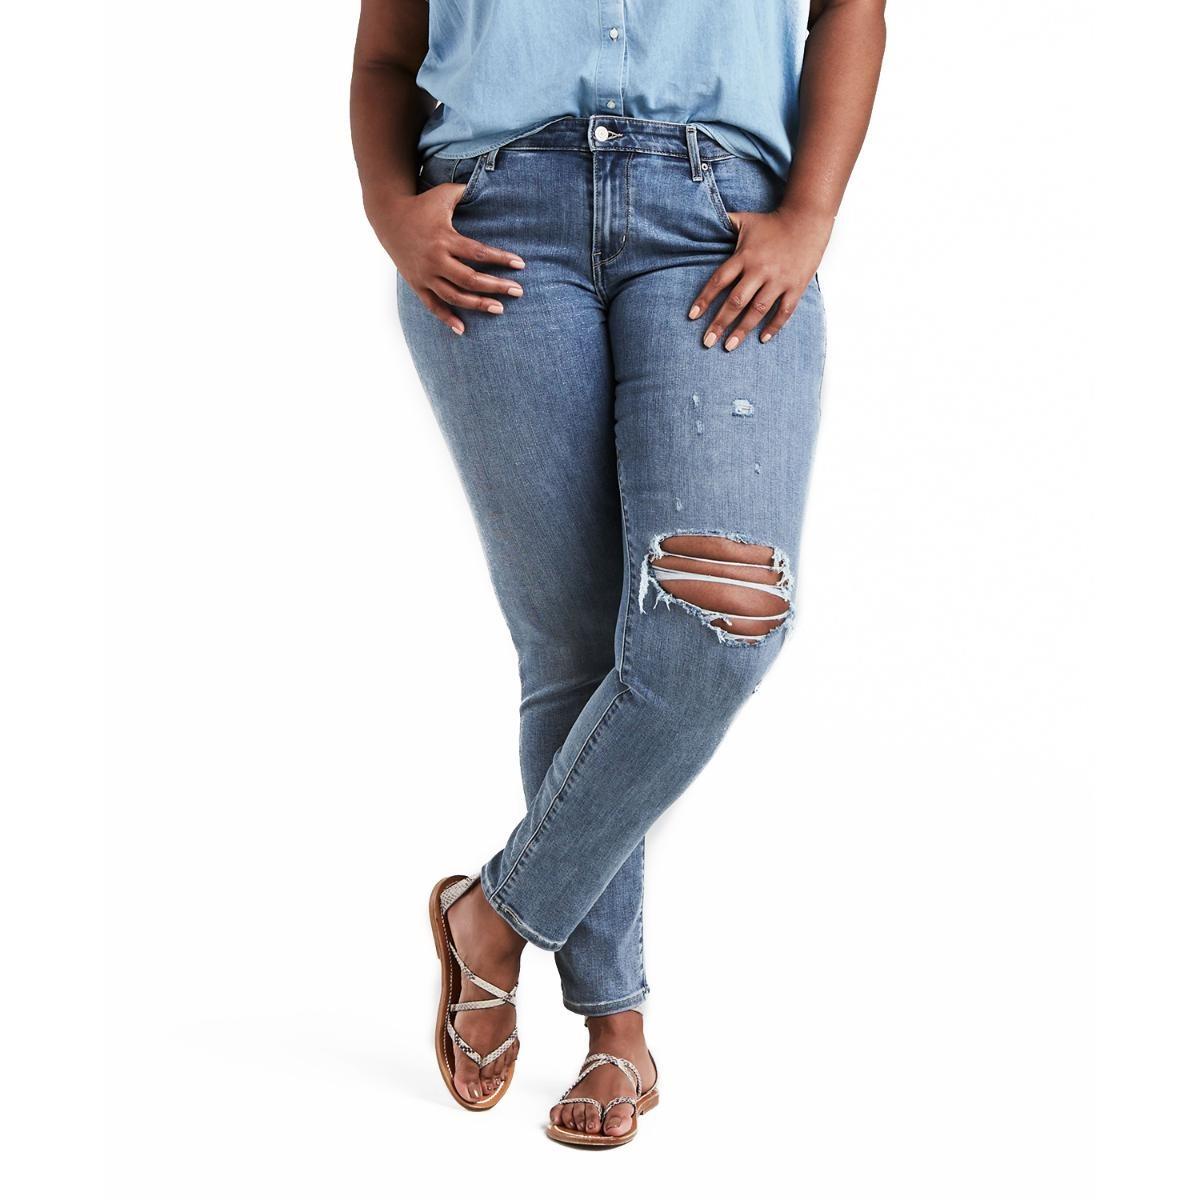 calça jeans levis women 711 skinny plus size média destroyed. Carregando  zoom. 93ef2bfdf5c